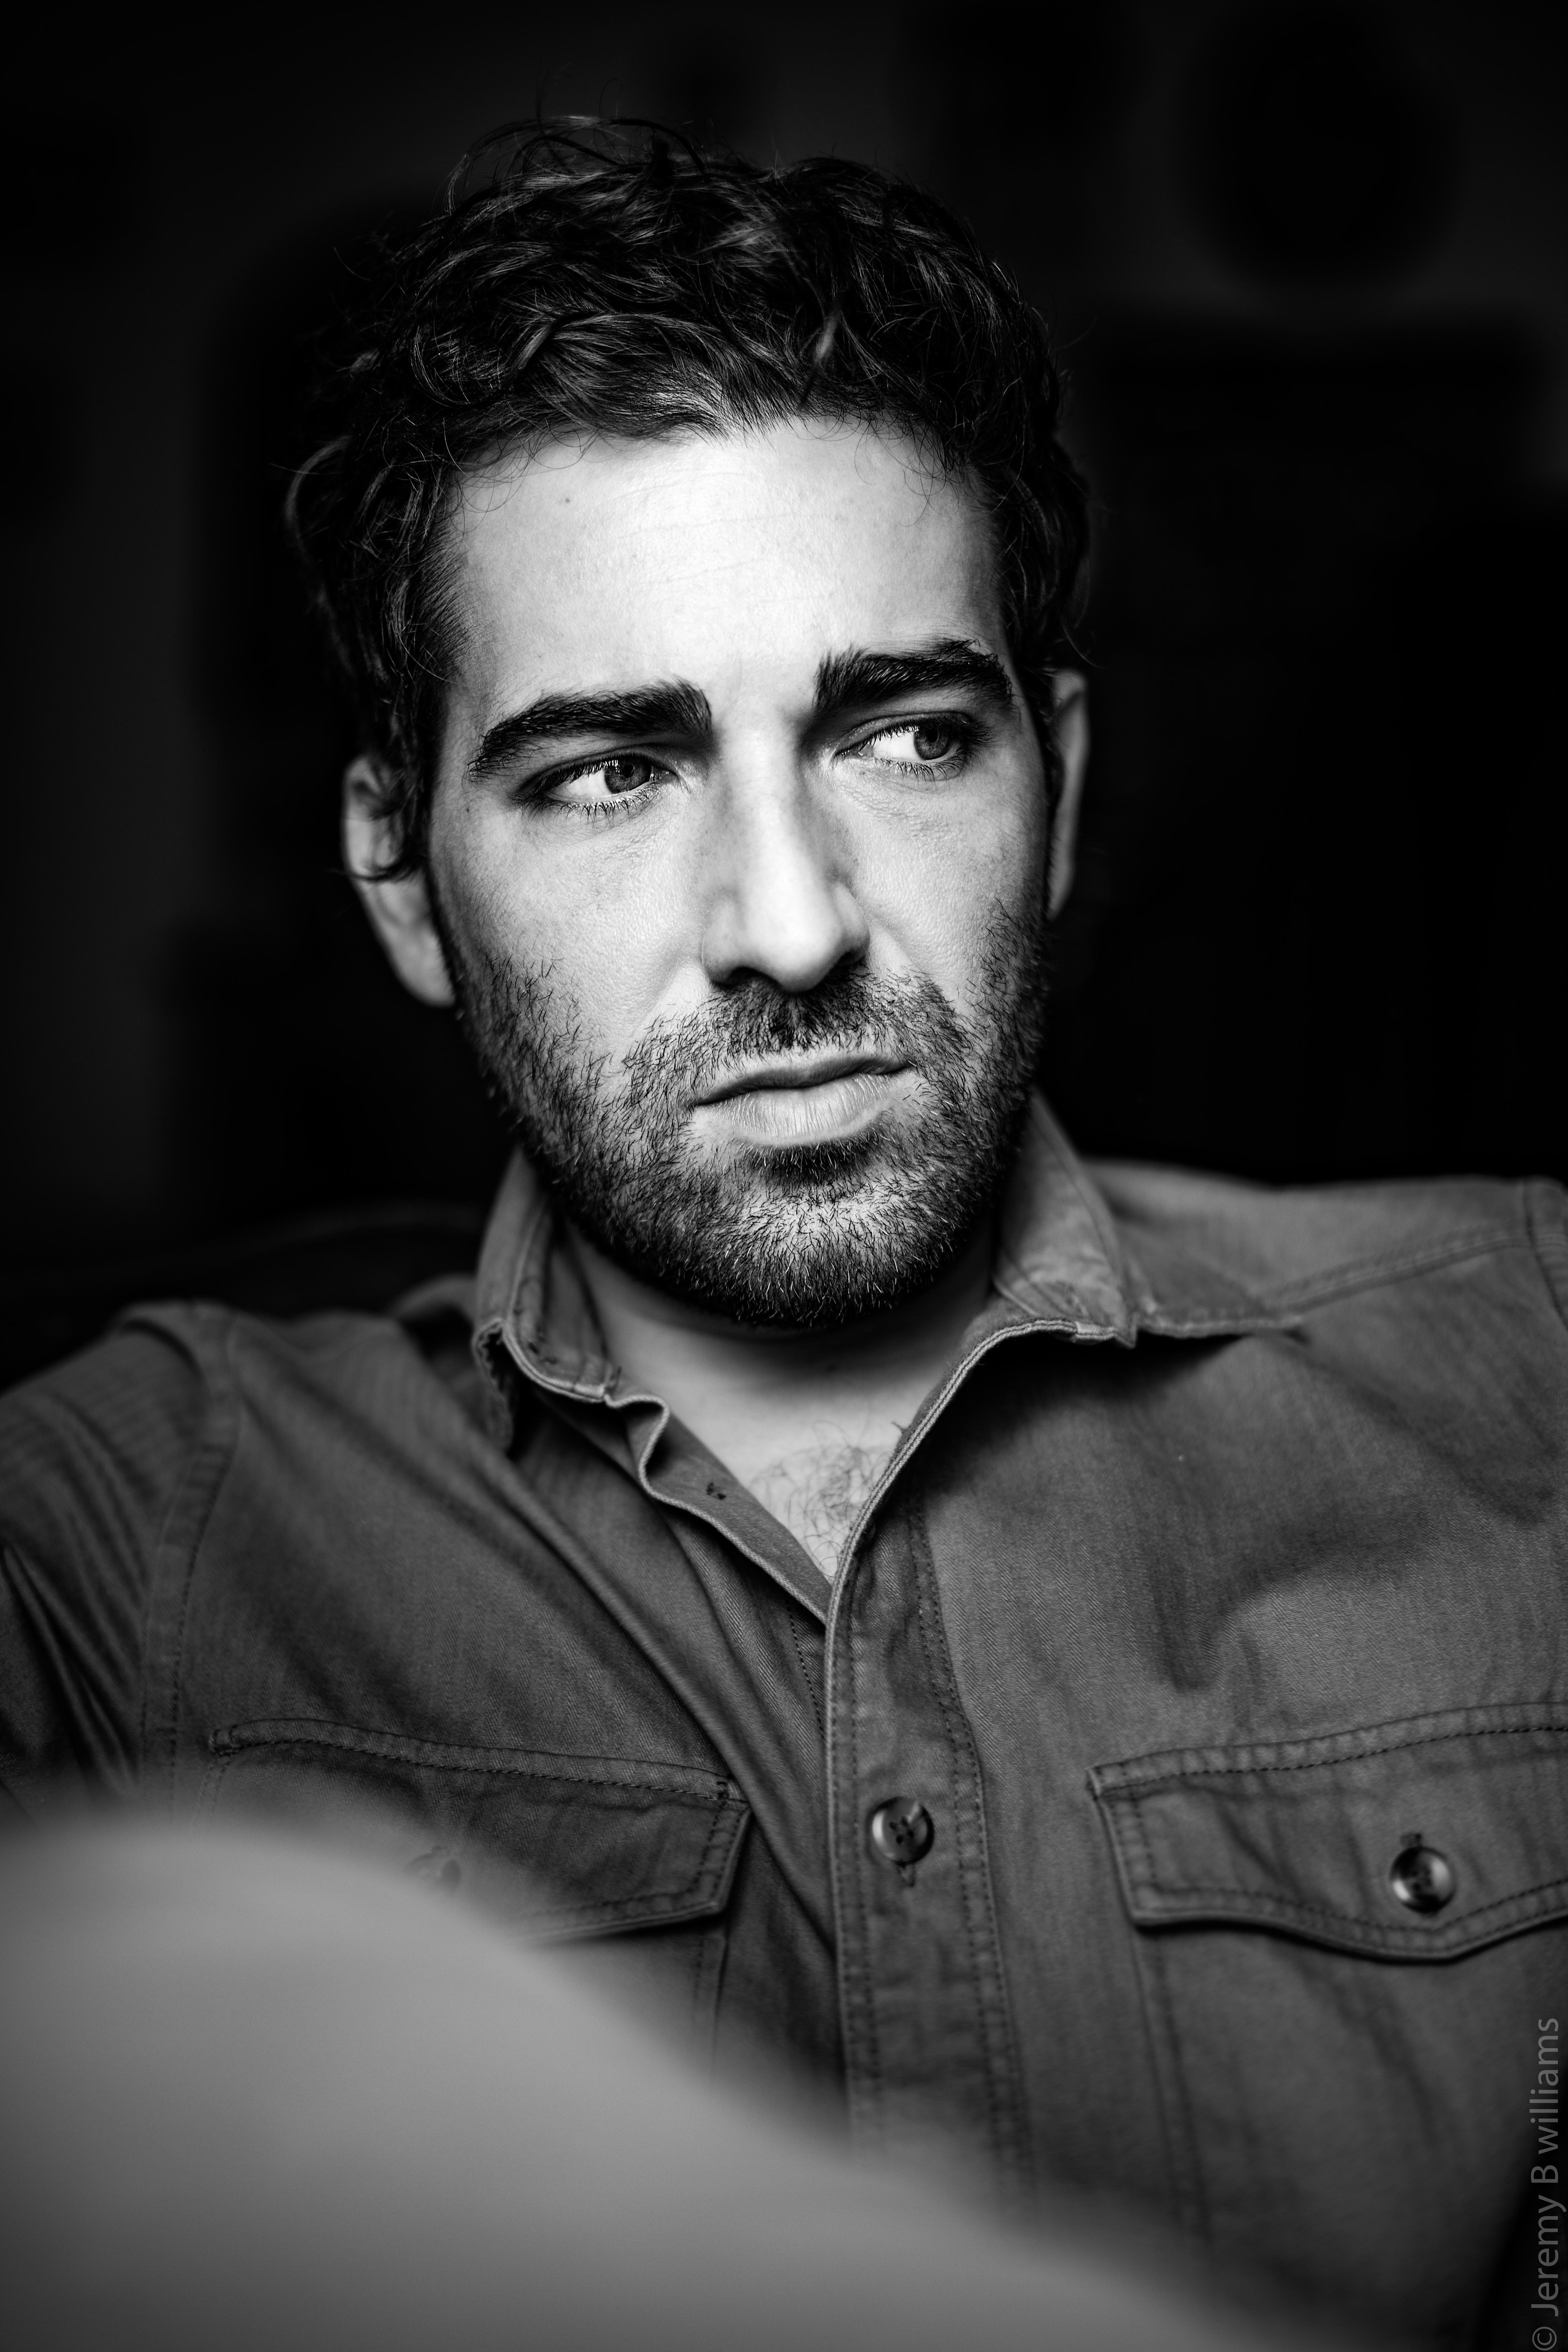 Alexandre Cafarelli